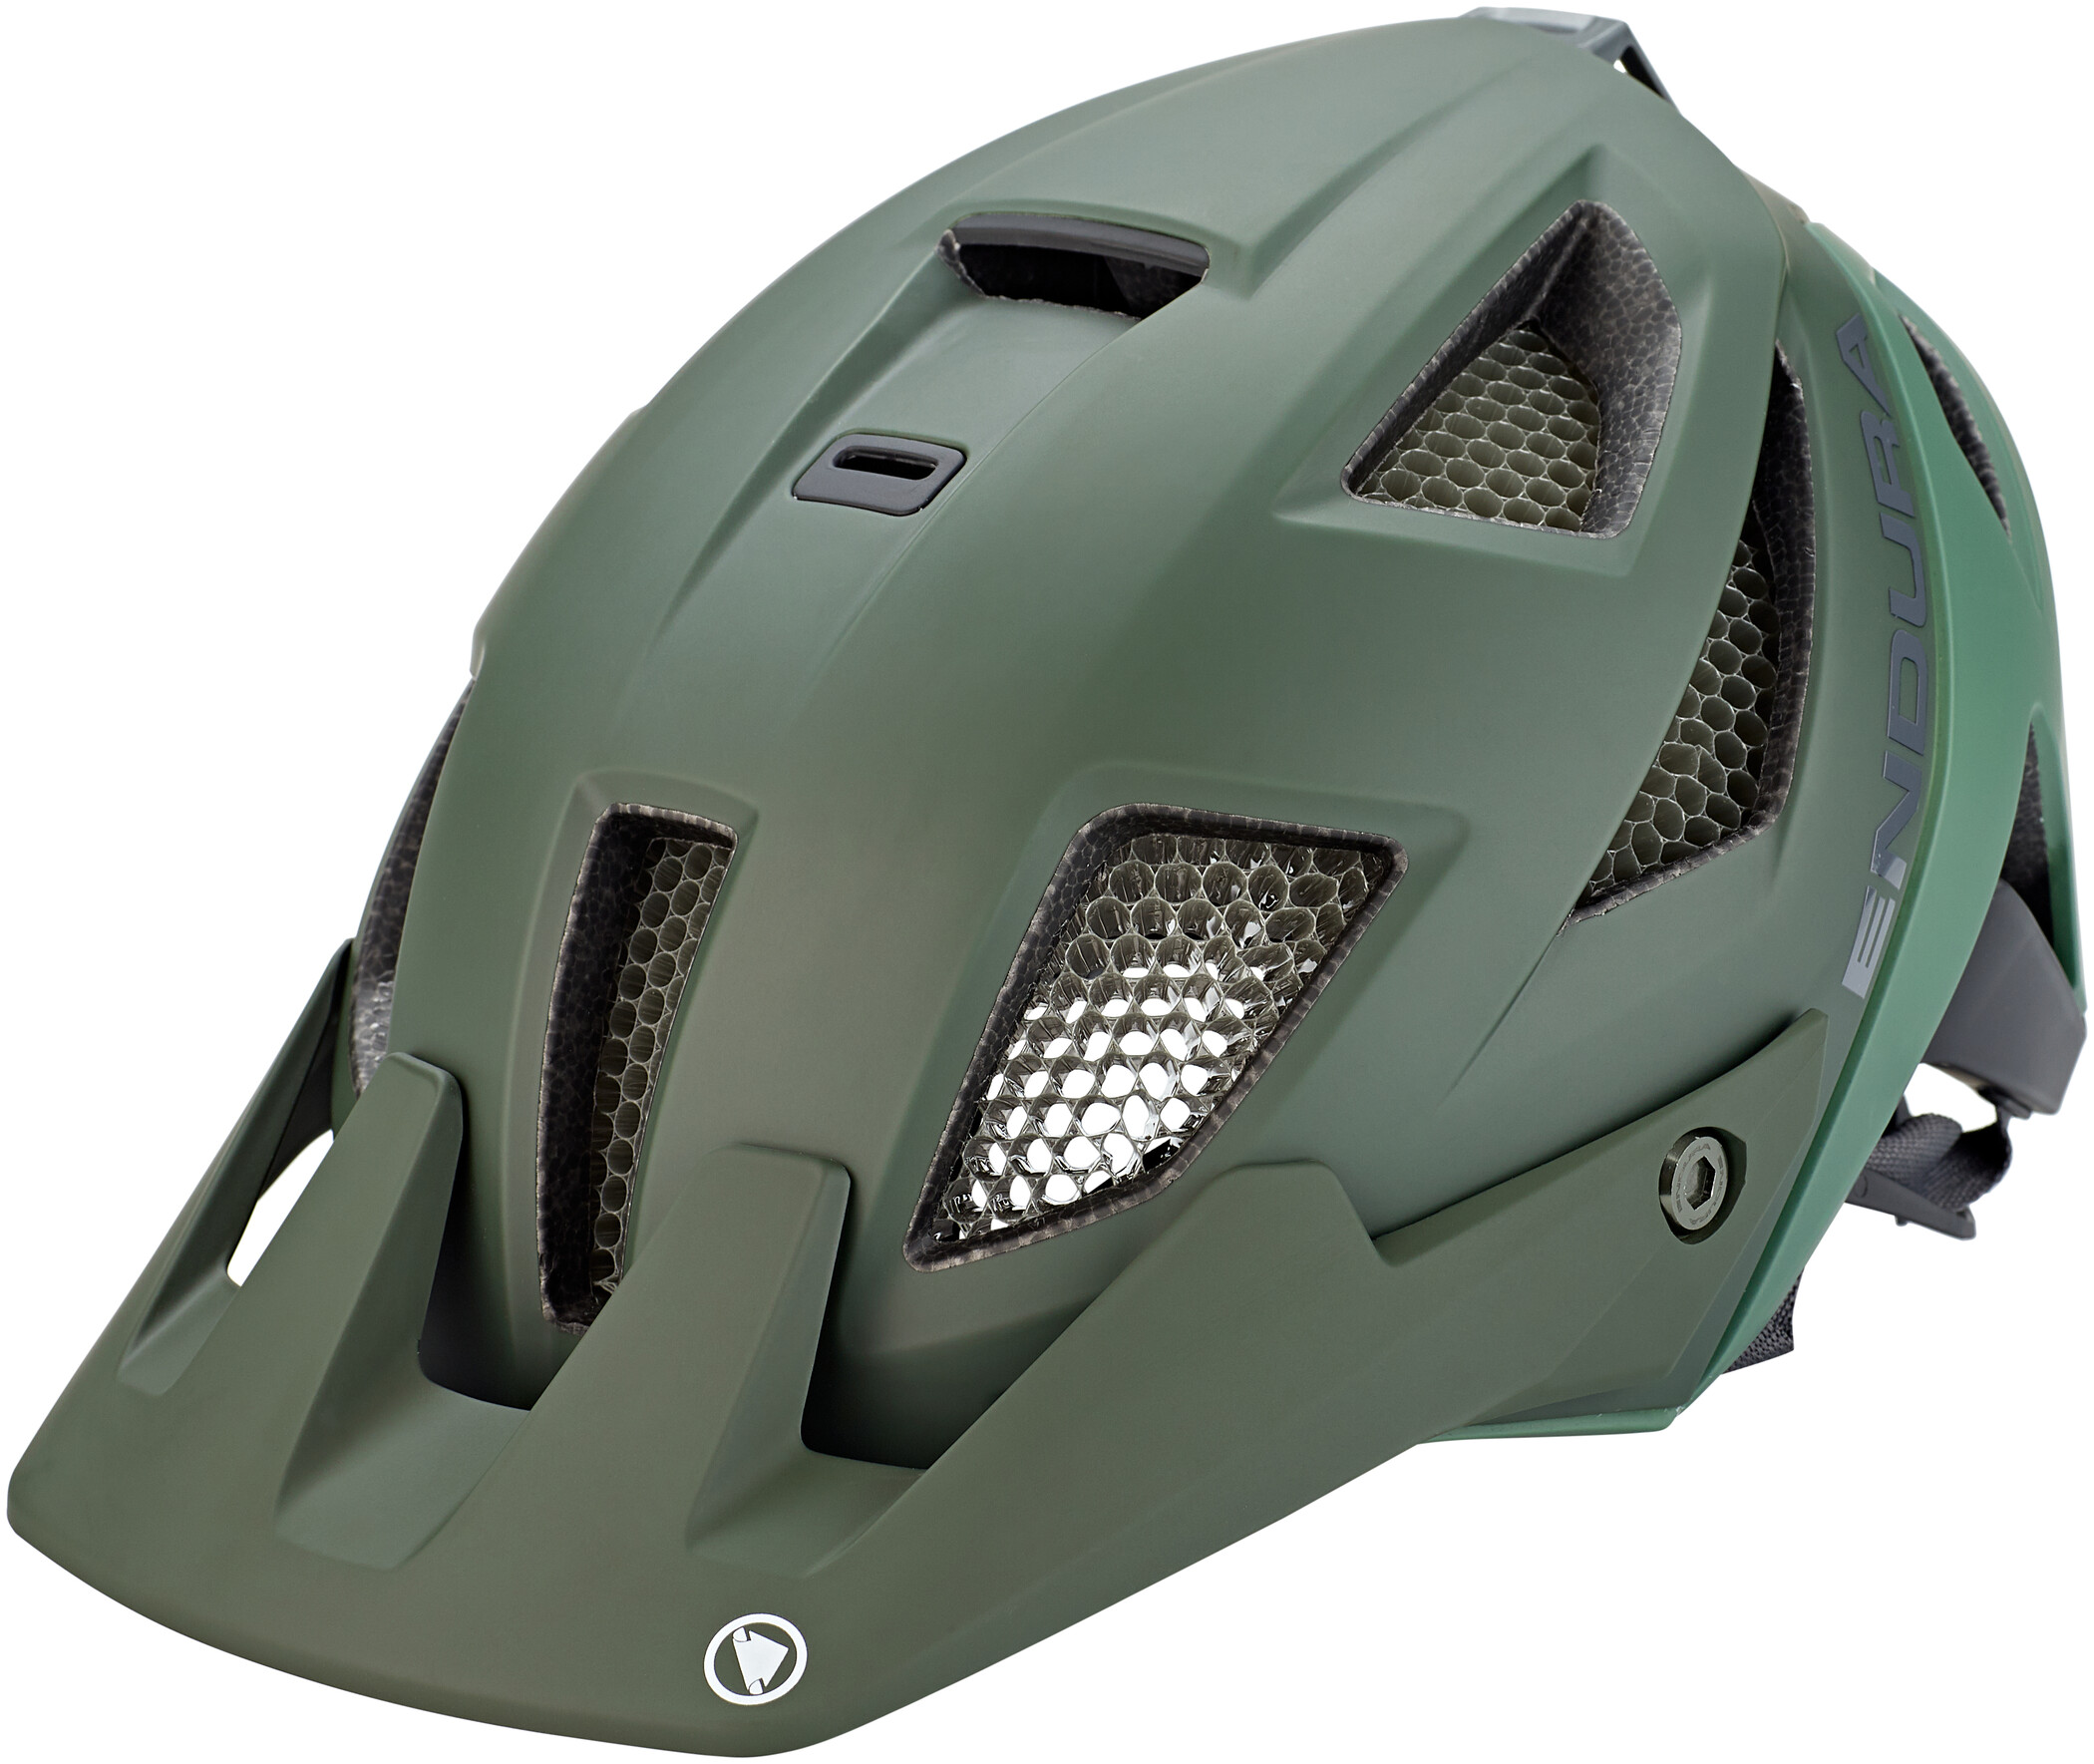 e125bcf3 https://www.bikester.dk/shimano-compact-jakke-herrer-sort-914763 ...